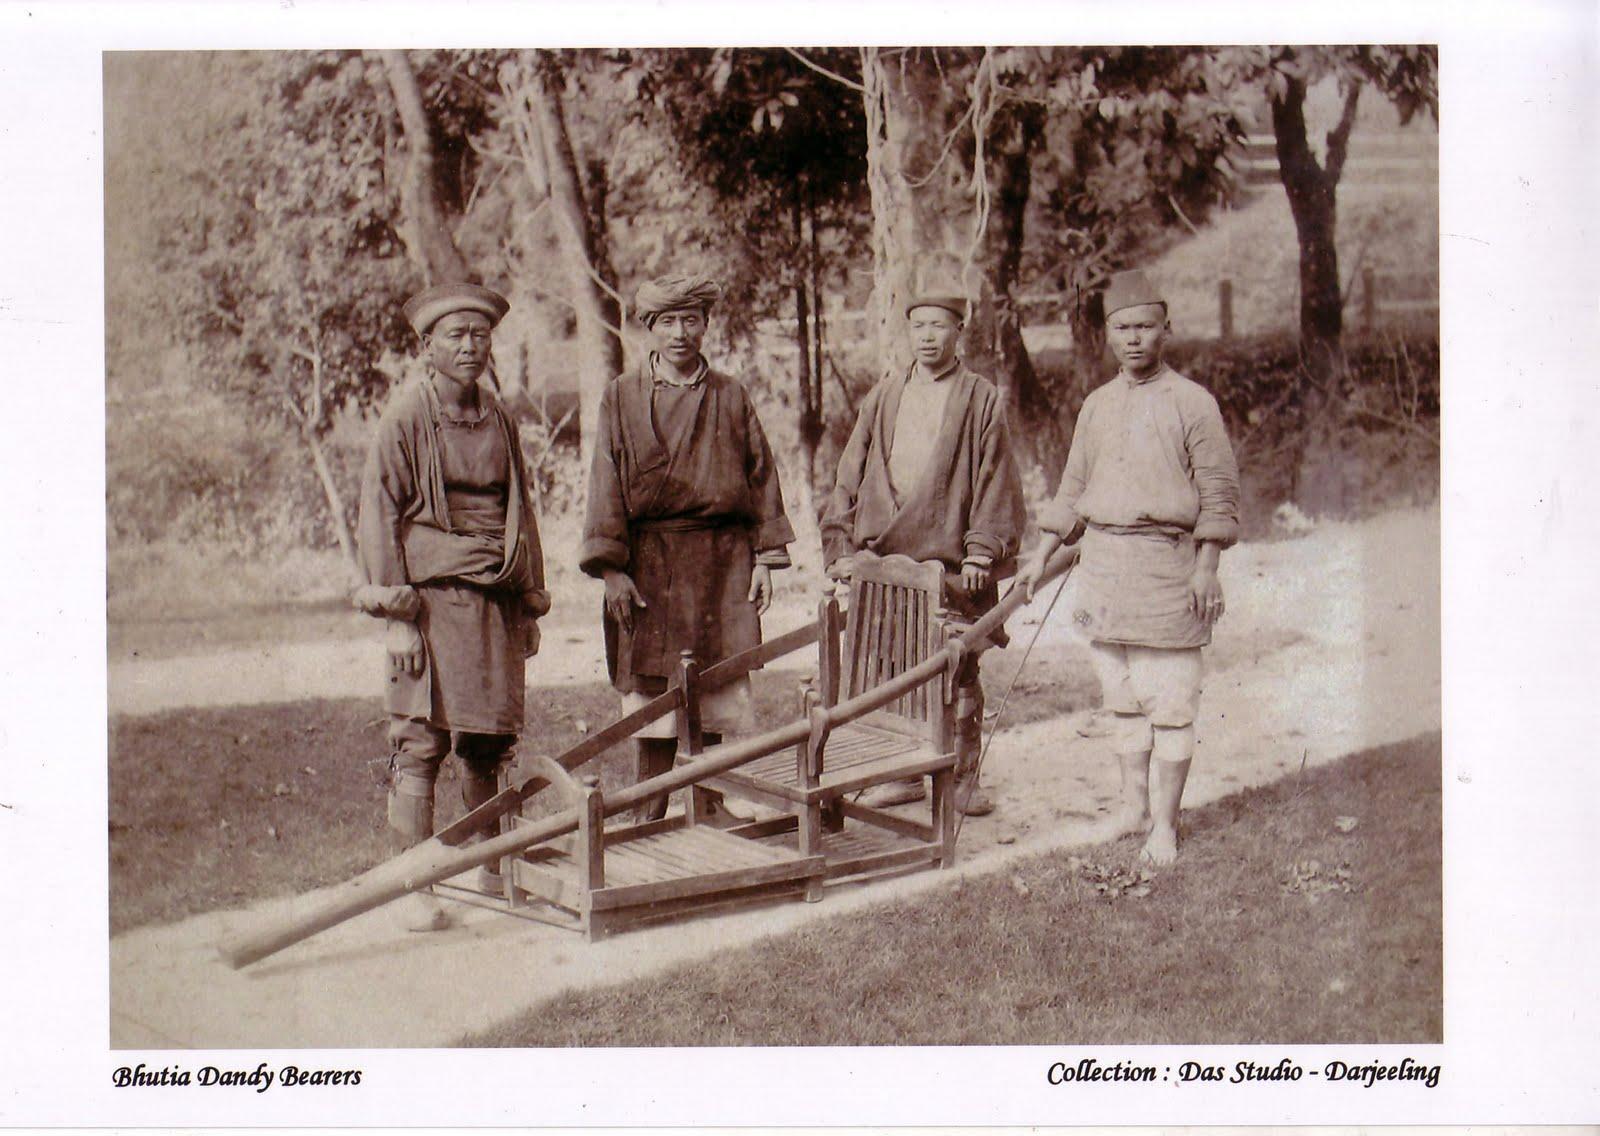 Bhutia Dandy (Carrying Chair) Bearers - c1880's